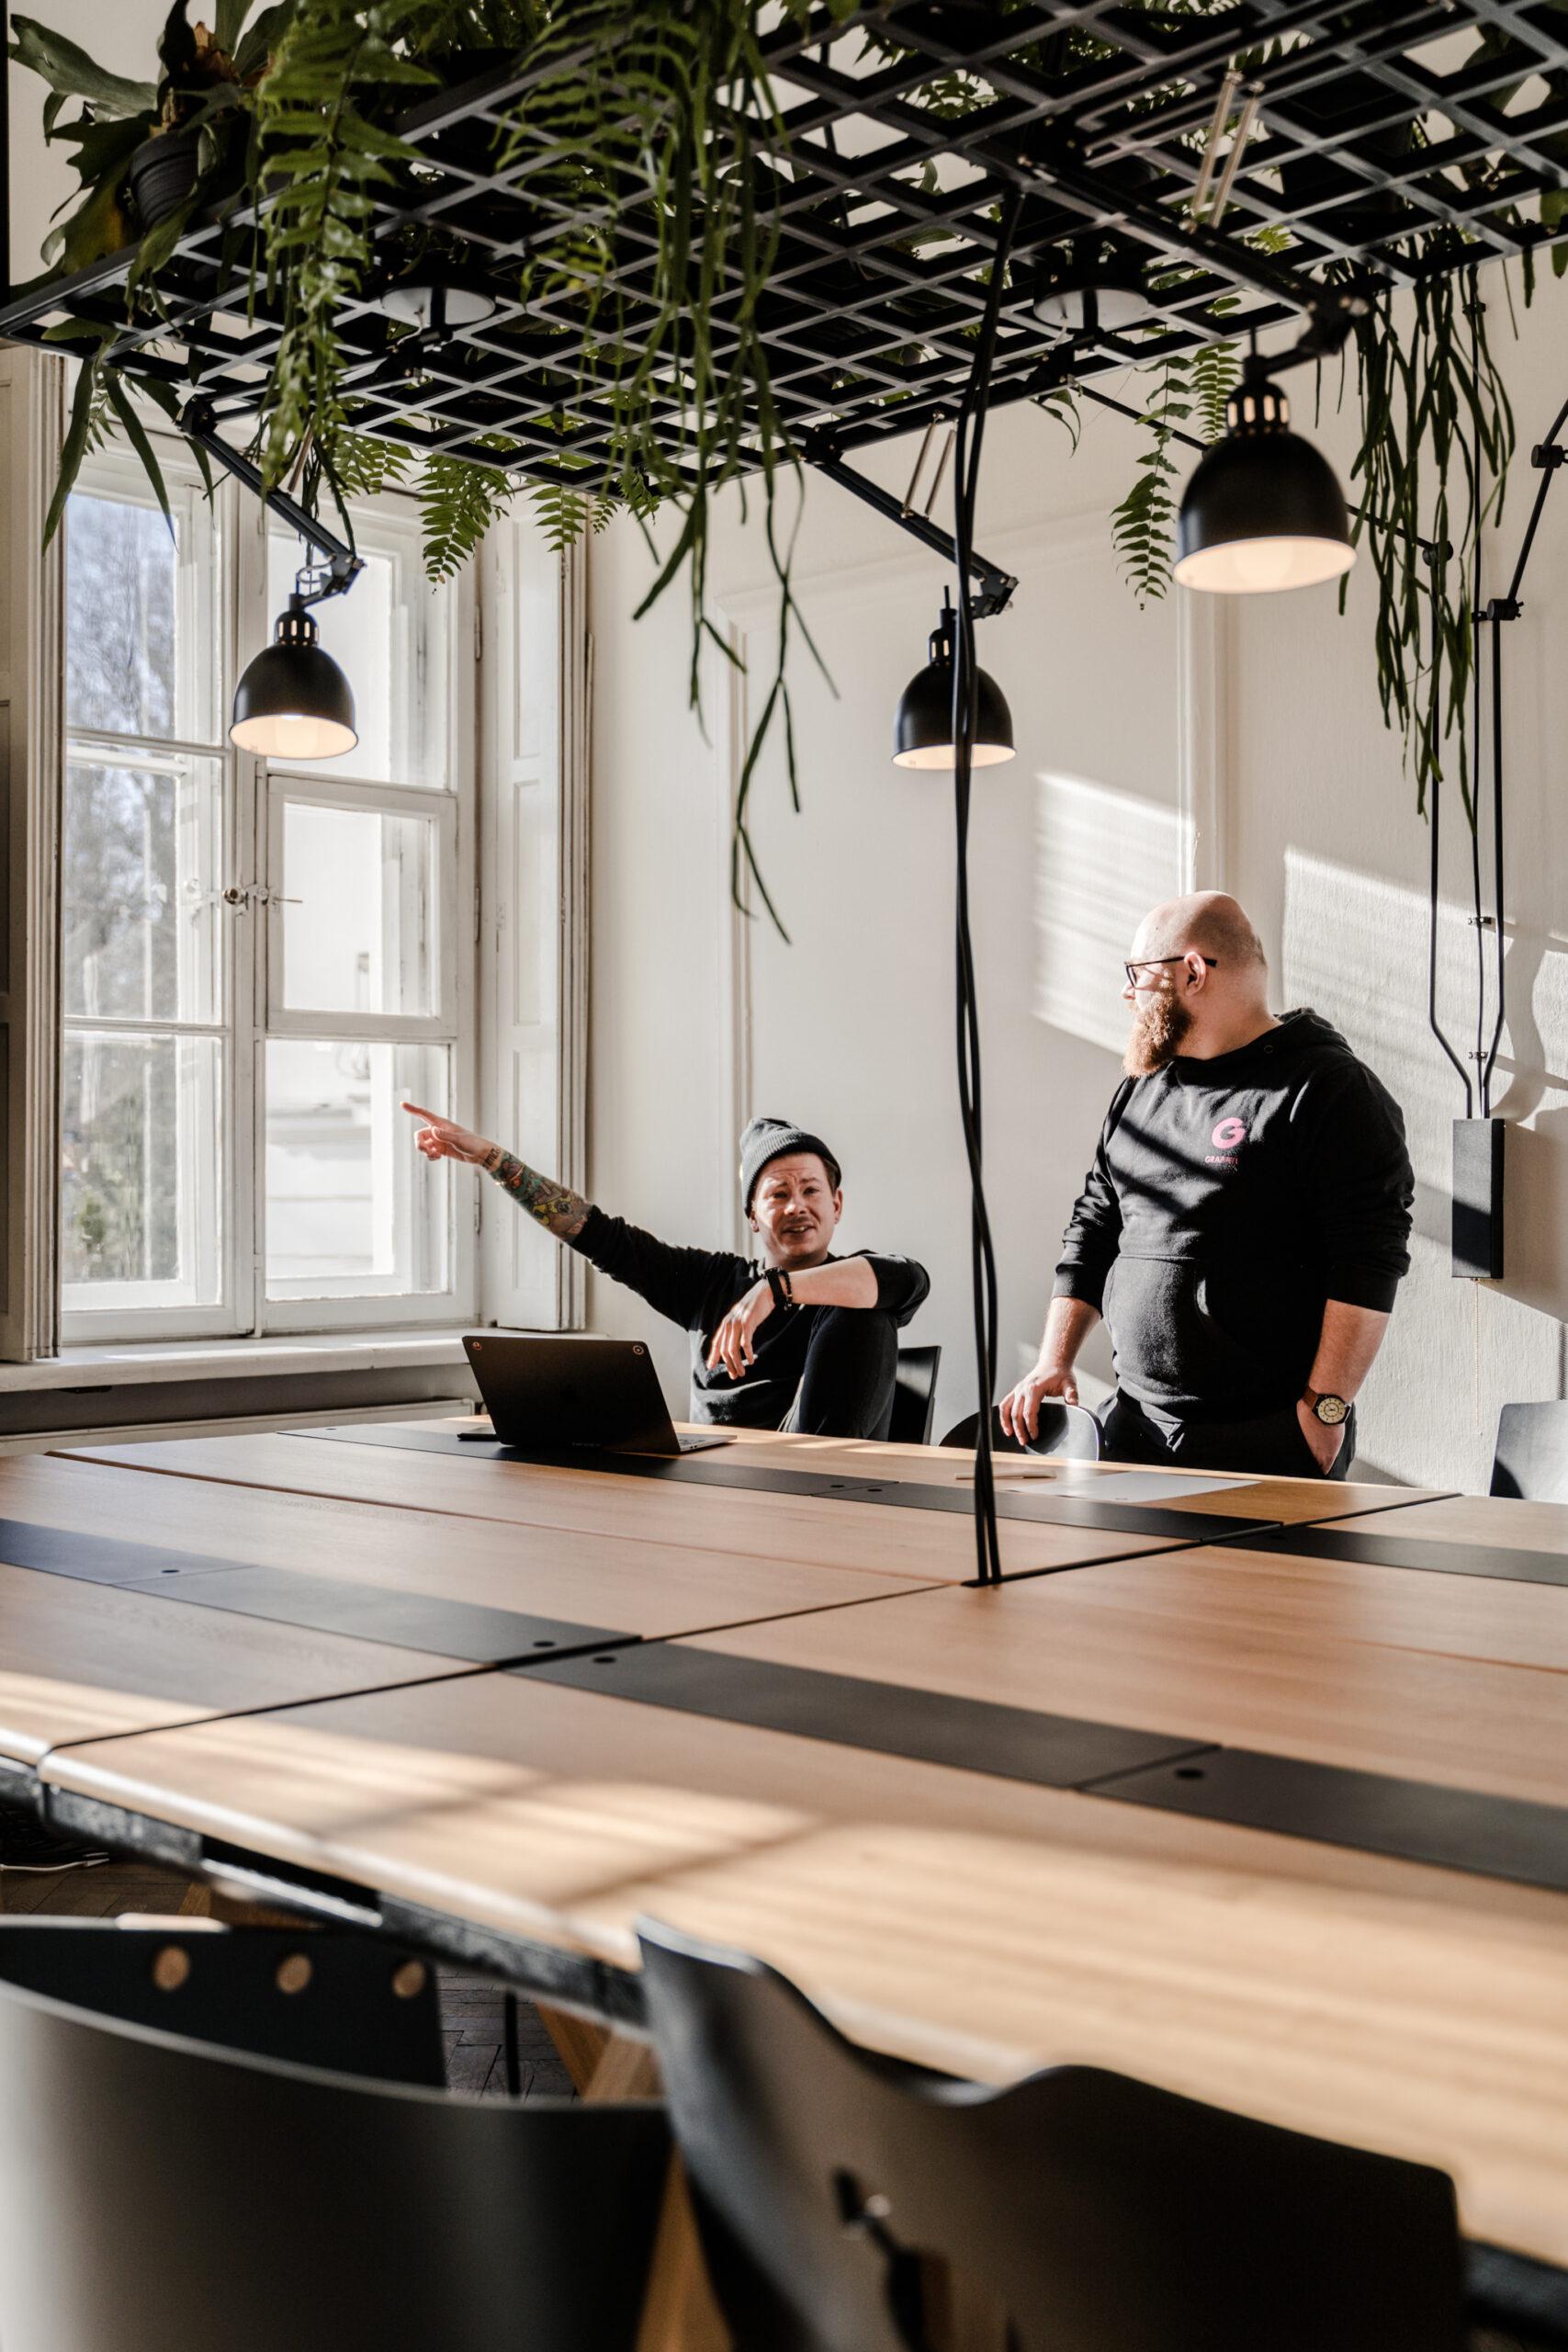 Dom i biuro